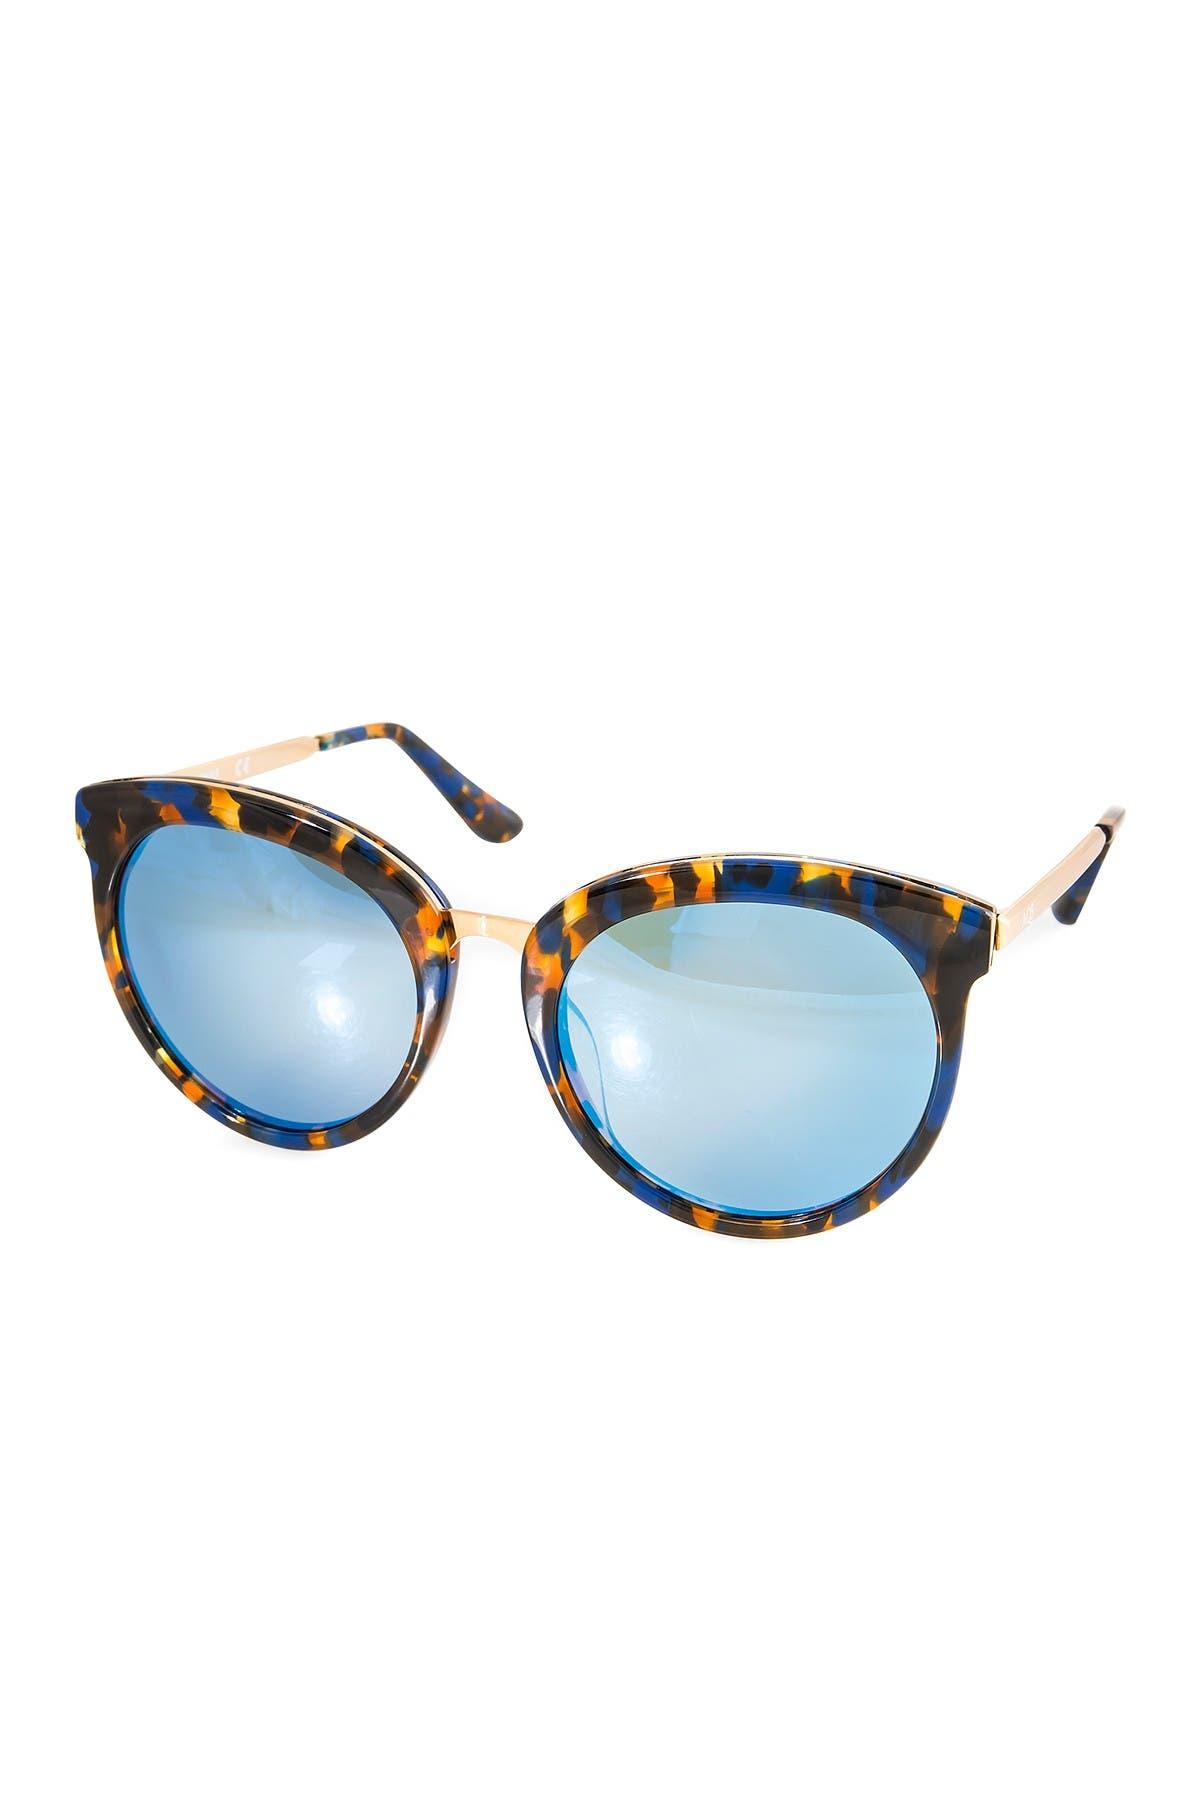 Image of AQS Poppy 54mm Round Sunglasses